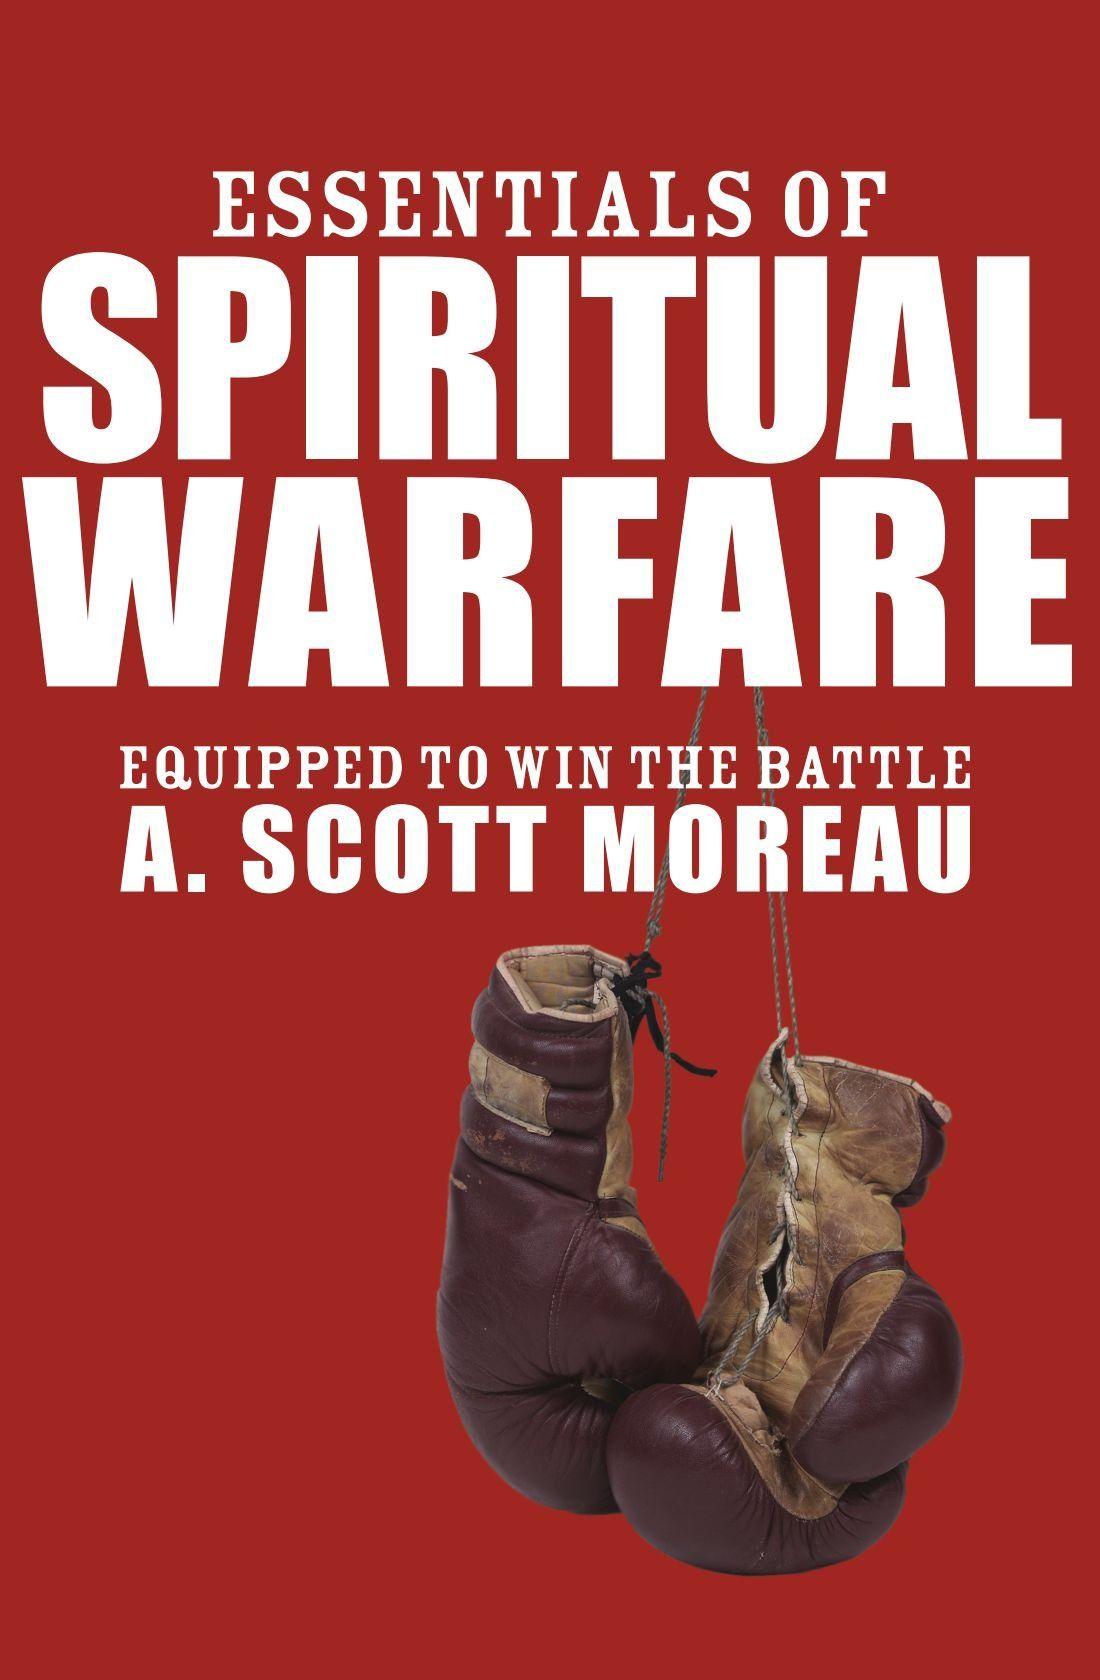 Essentials of Spiritual Warfare: Equipped to Win the Battle: A. Scott  Moreau: 9781556358593: Amazon.com: Books